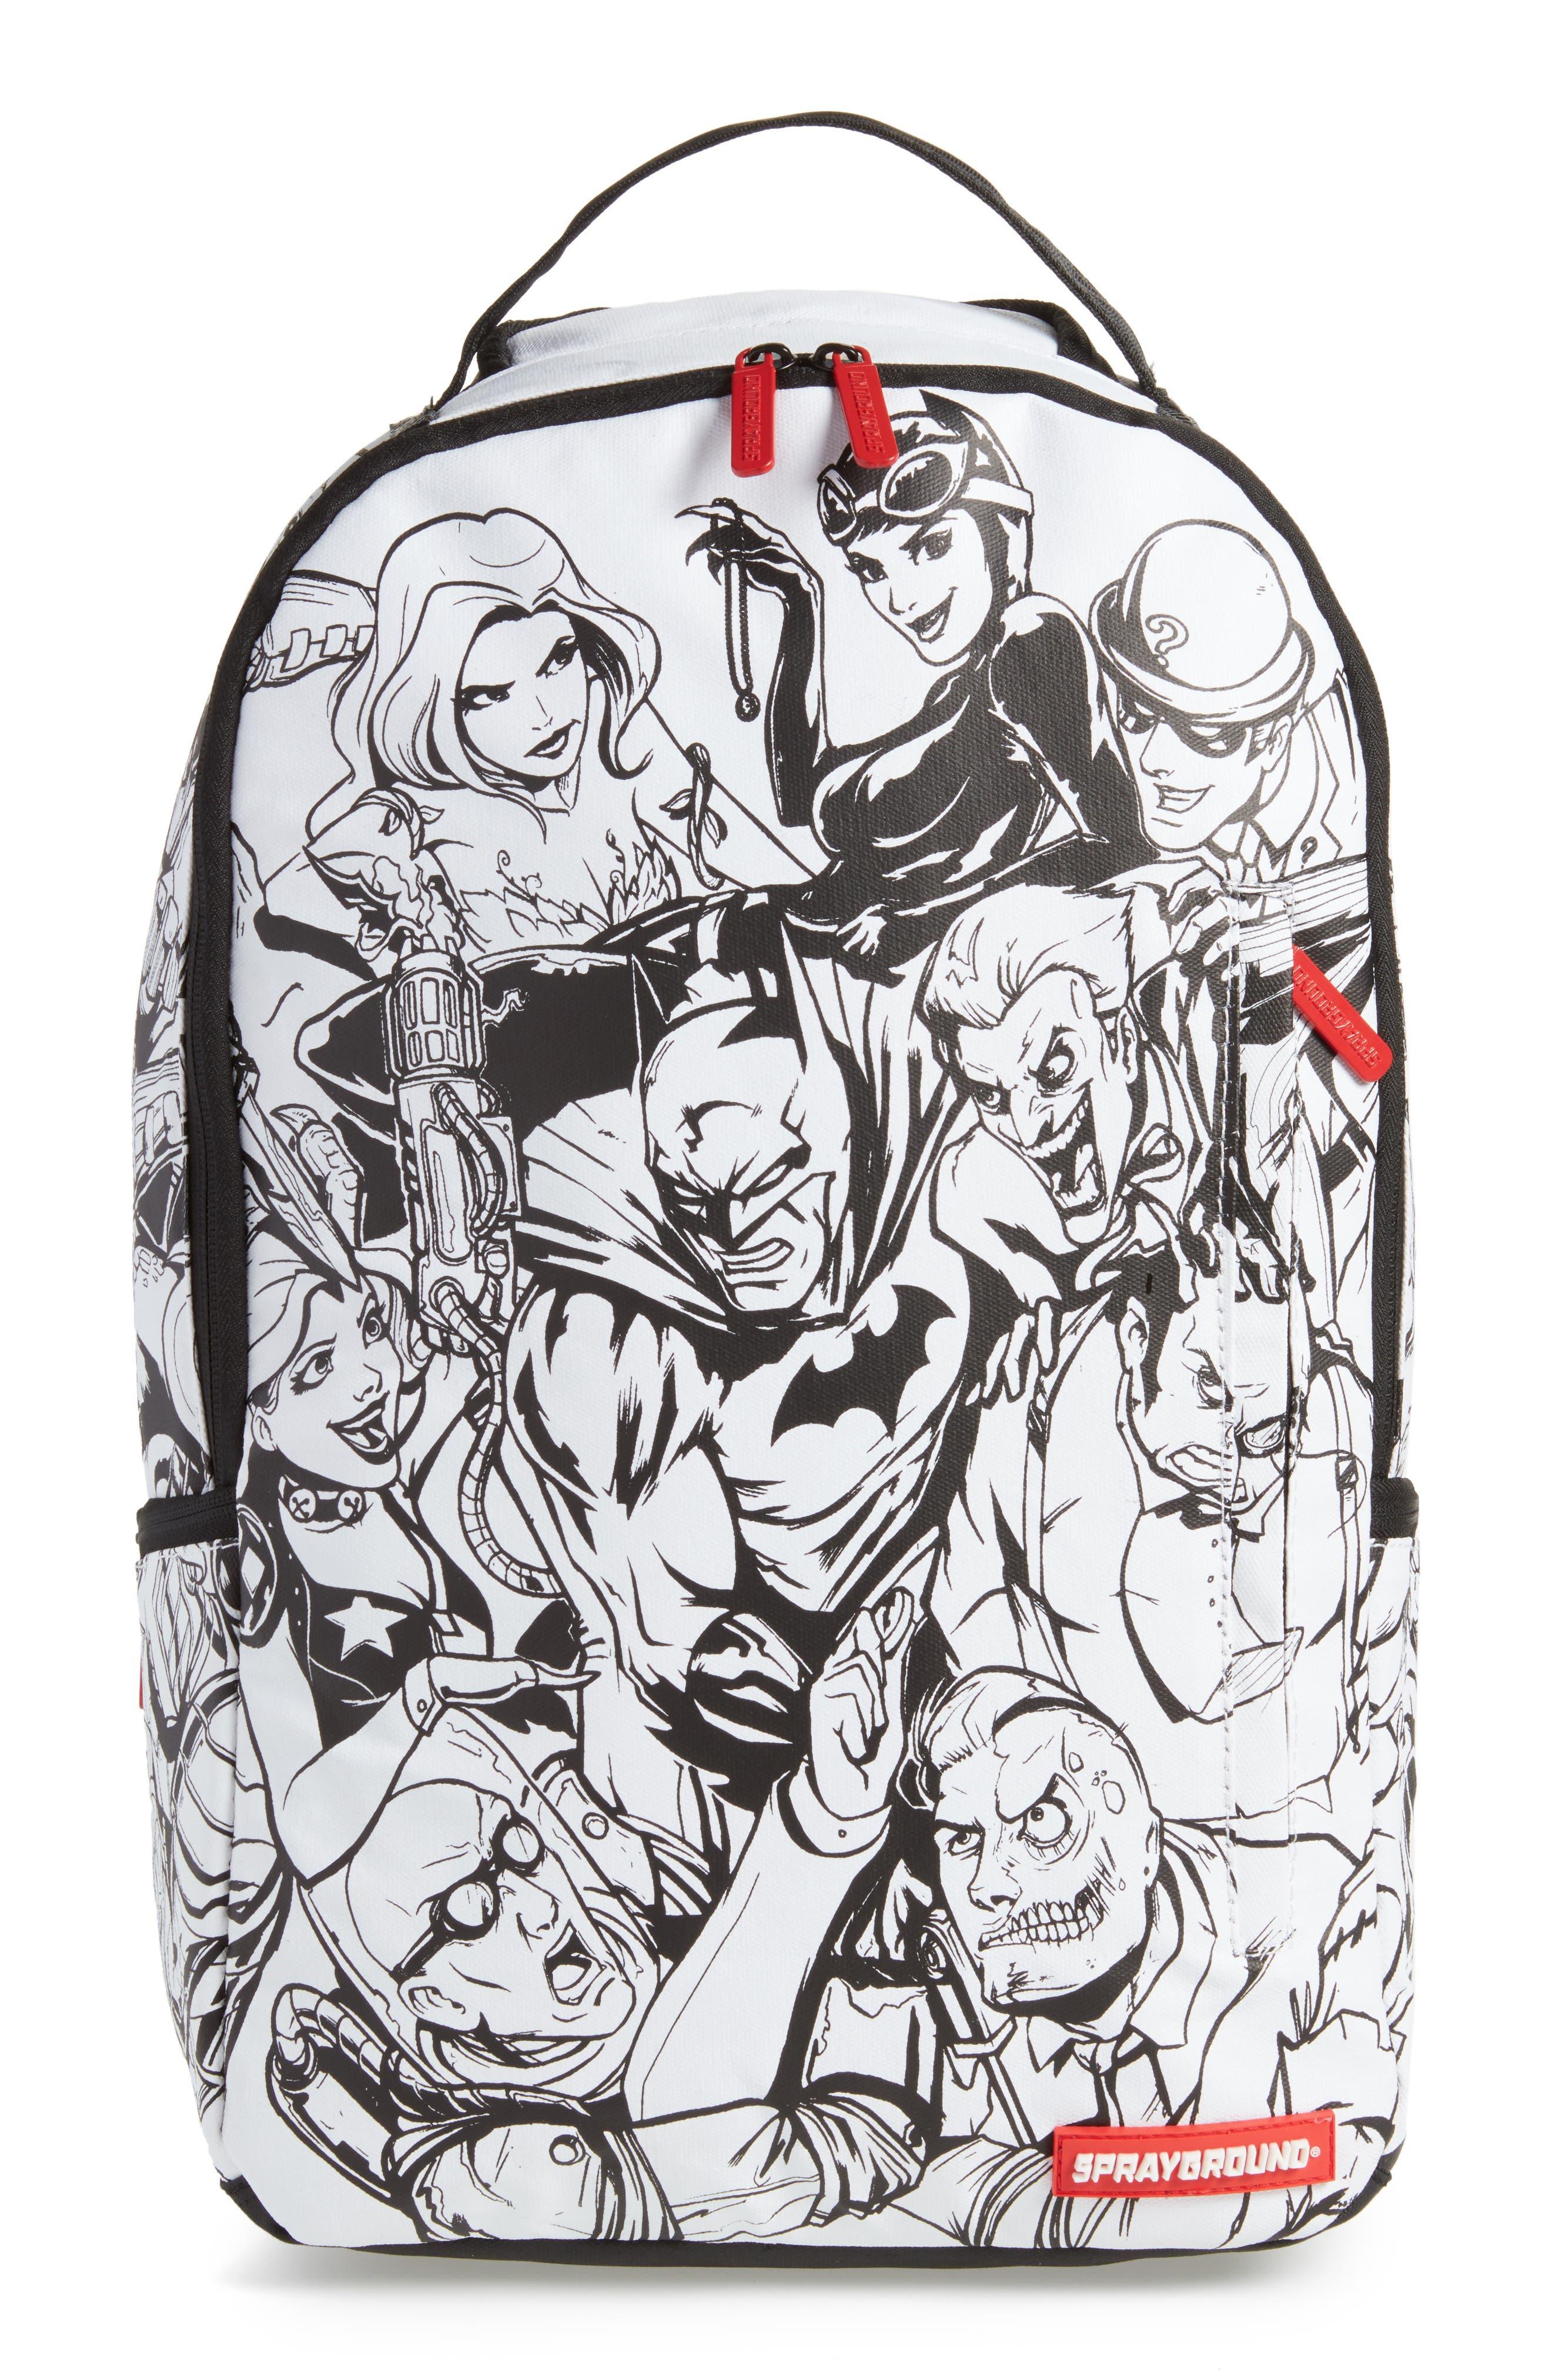 Batman DIY Villains Backpack,                             Main thumbnail 1, color,                             Black/ White